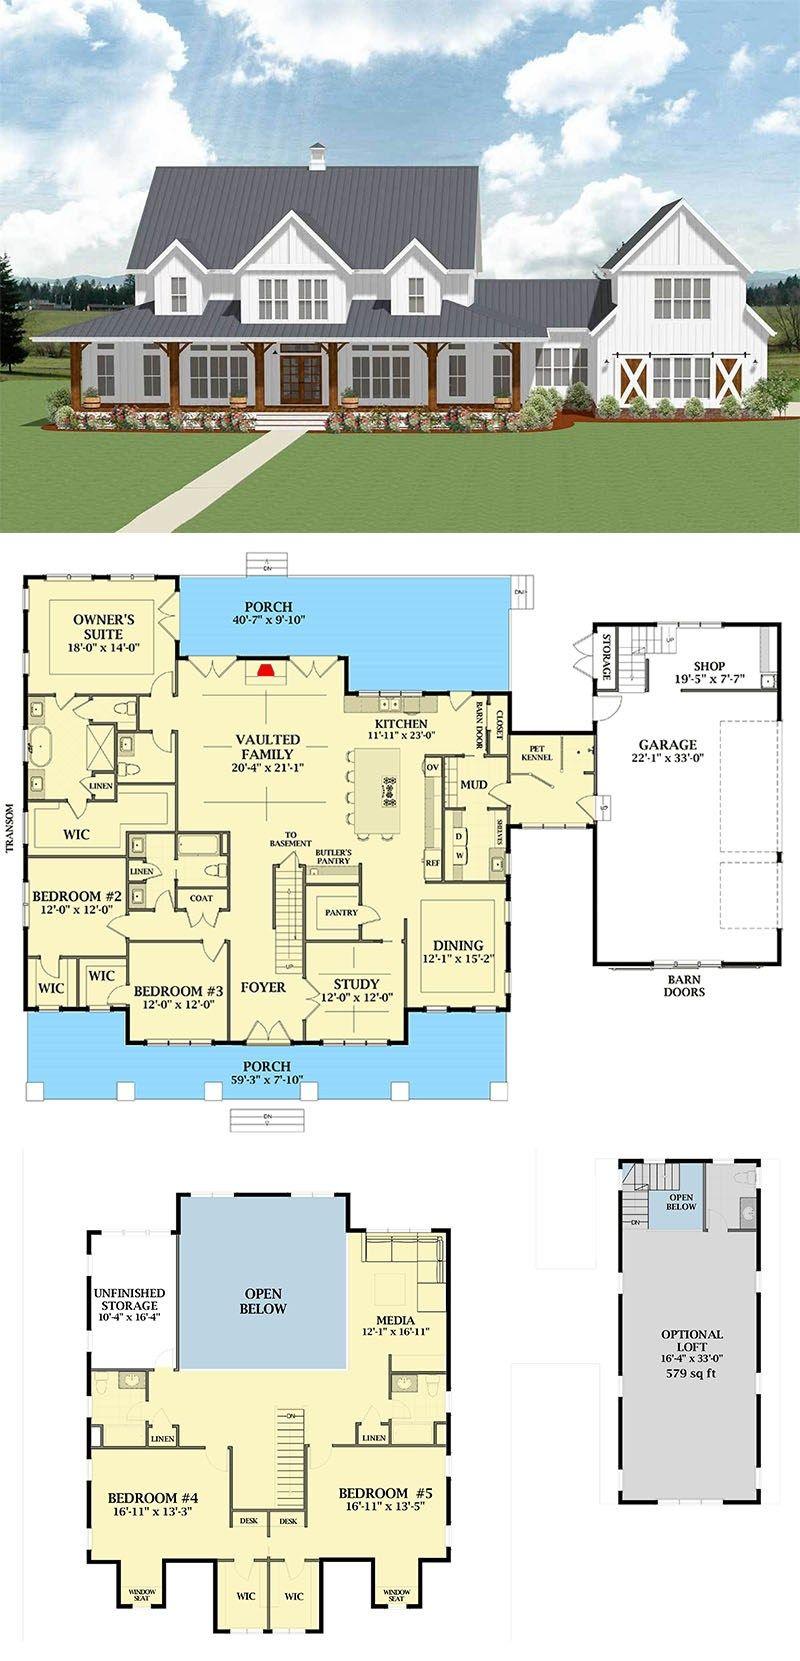 7 Most Popular Farmhouse Plans With Pictures Nikki S Plate House Plans Farmhouse House Blueprints Farmhouse Plans